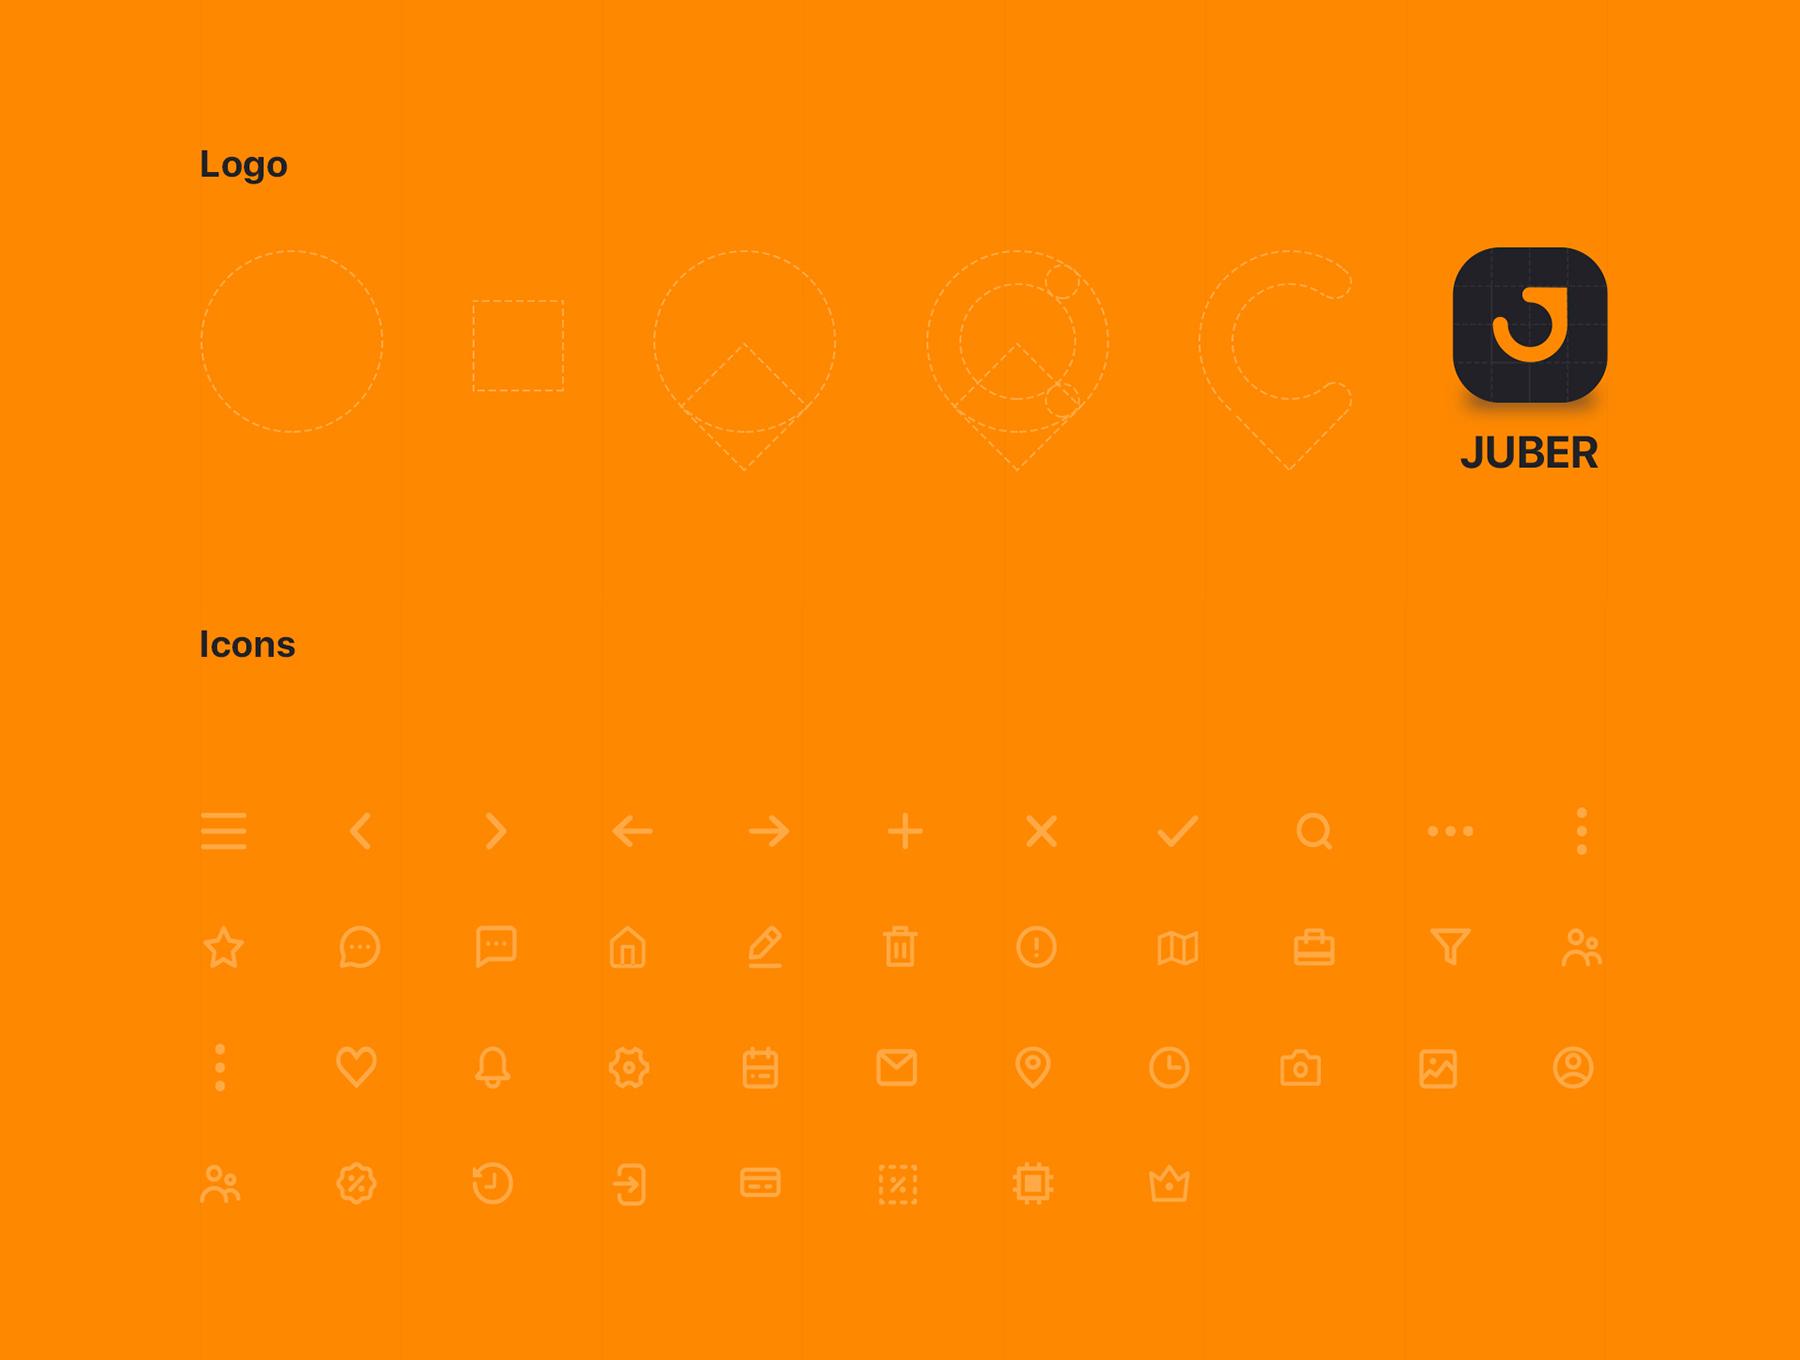 完美的小汽车租赁&打车APP应用UI设计模板[XD,Sketch,Fig] JUBER Car rental mobile UI Kit